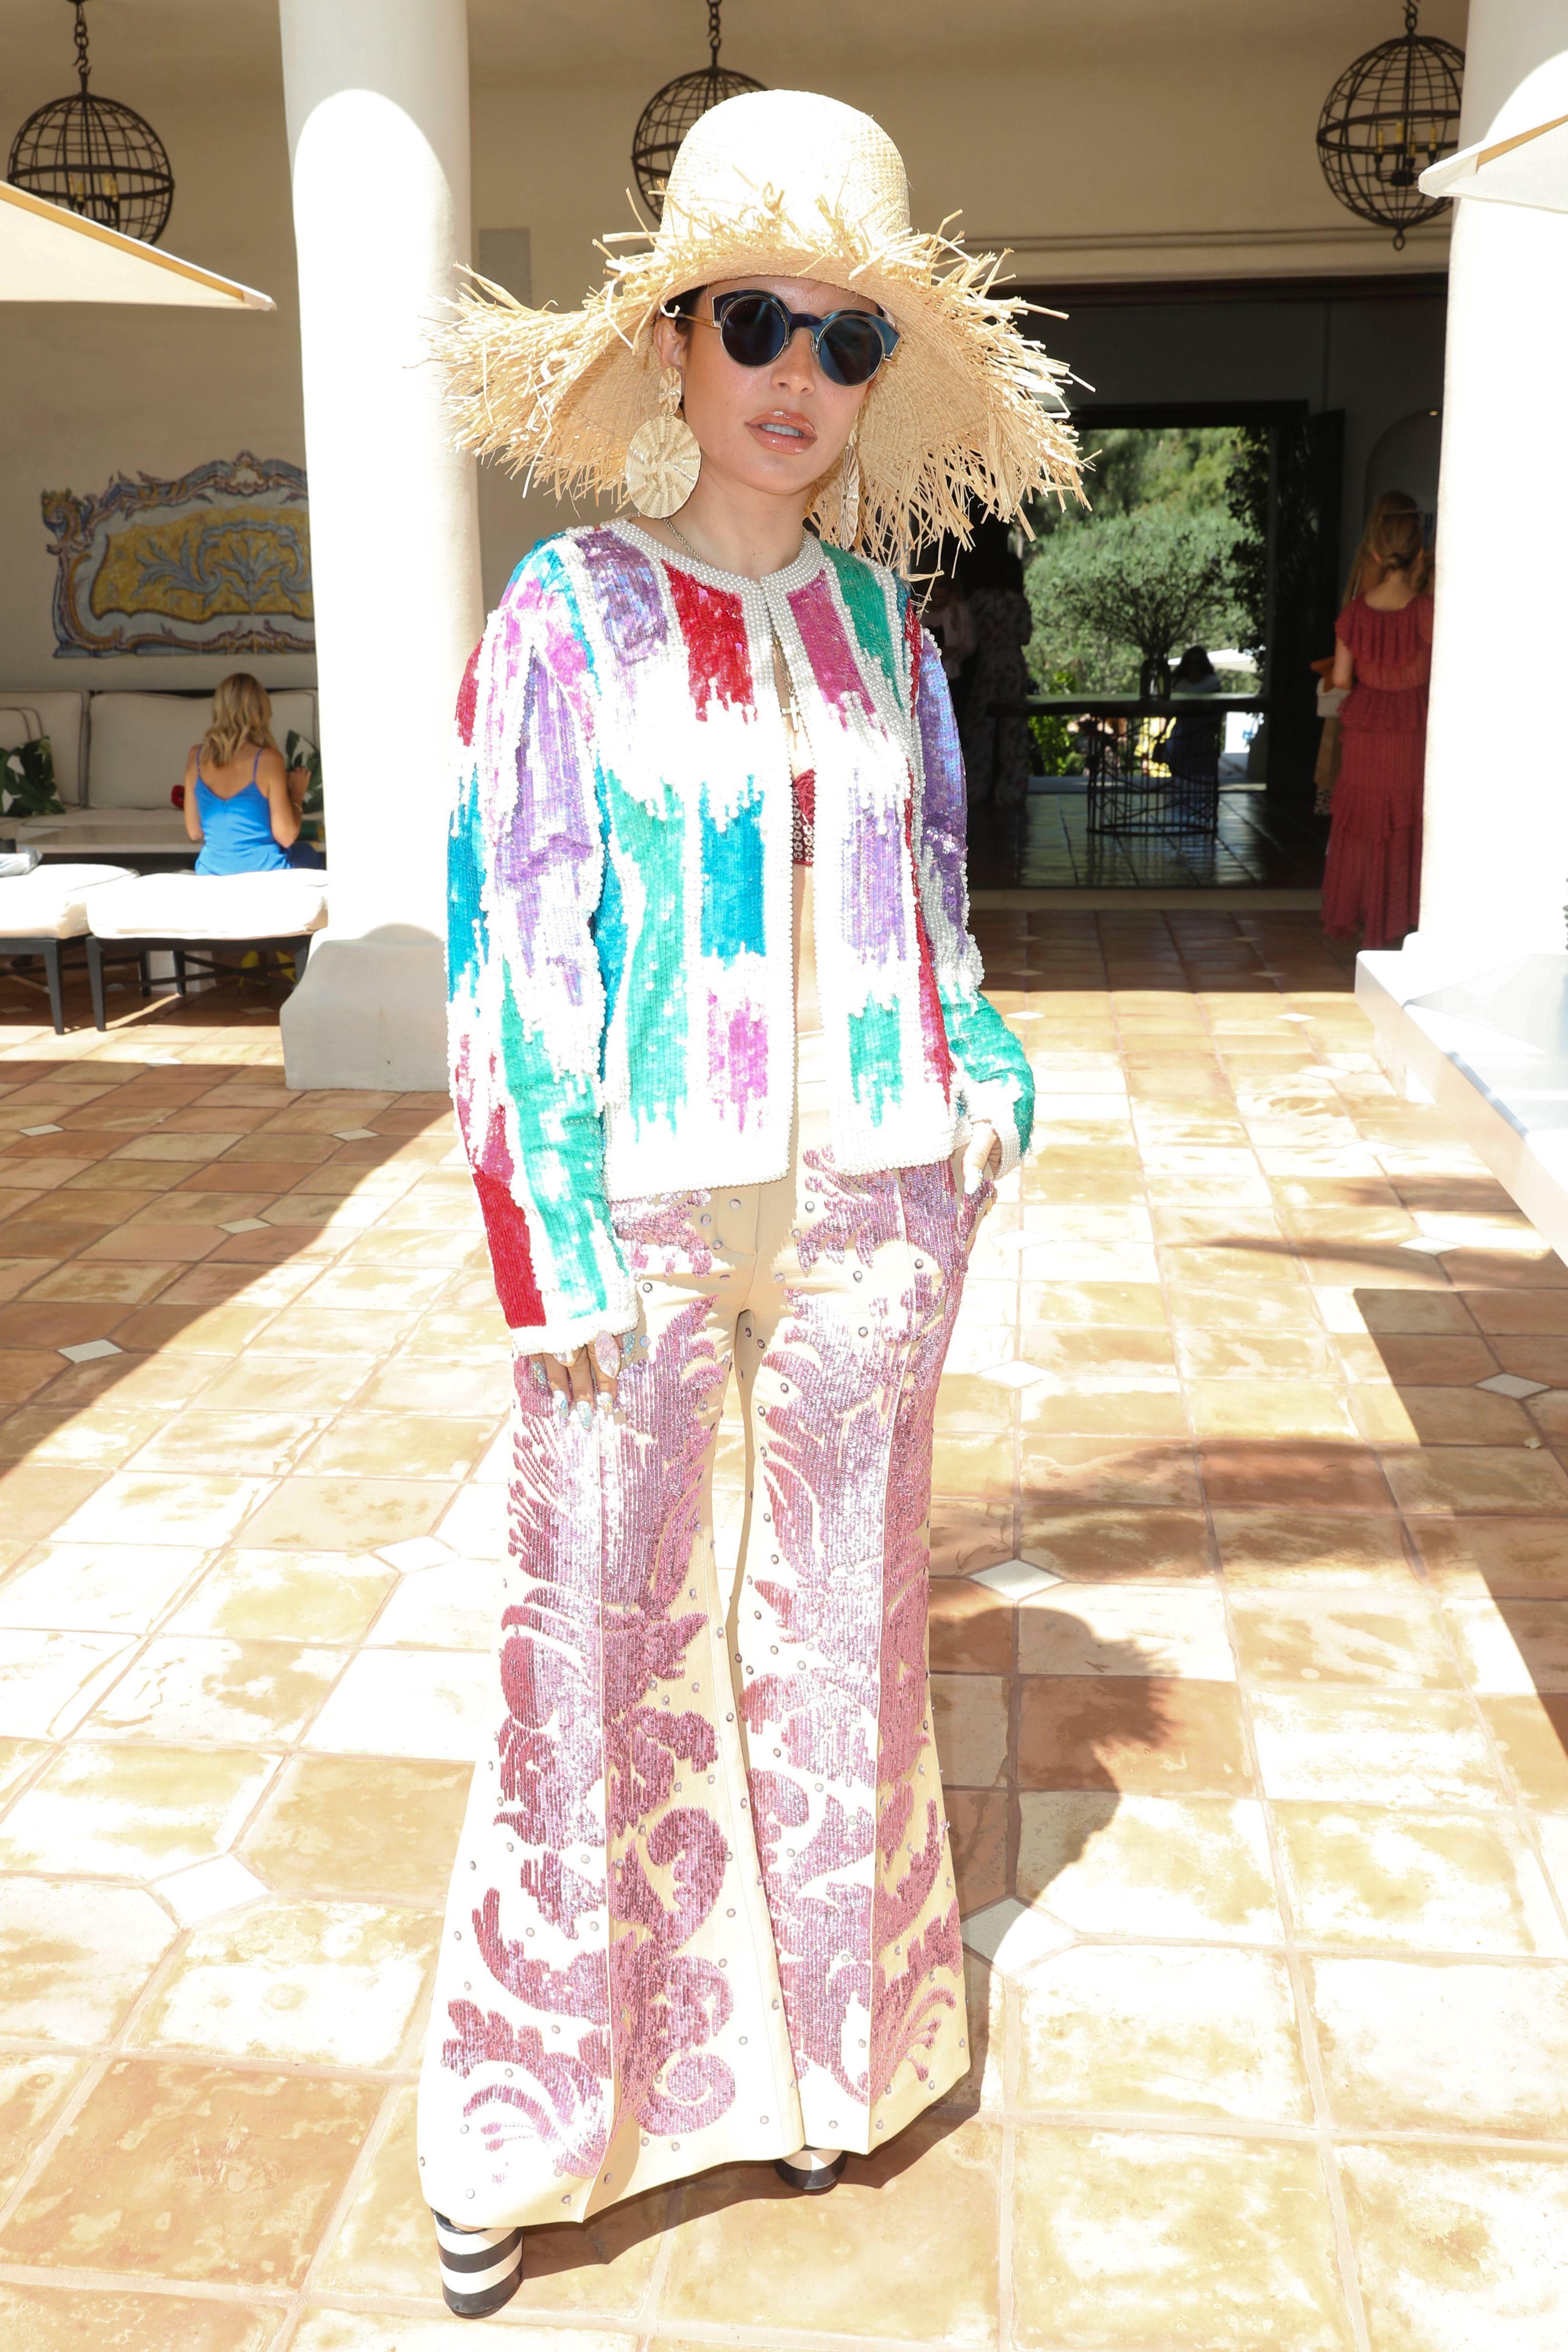 AuretaH.E.A.R.T. X Valentino, 14 Beverly Park, Los Angeles, USA - 24 Apr 2019